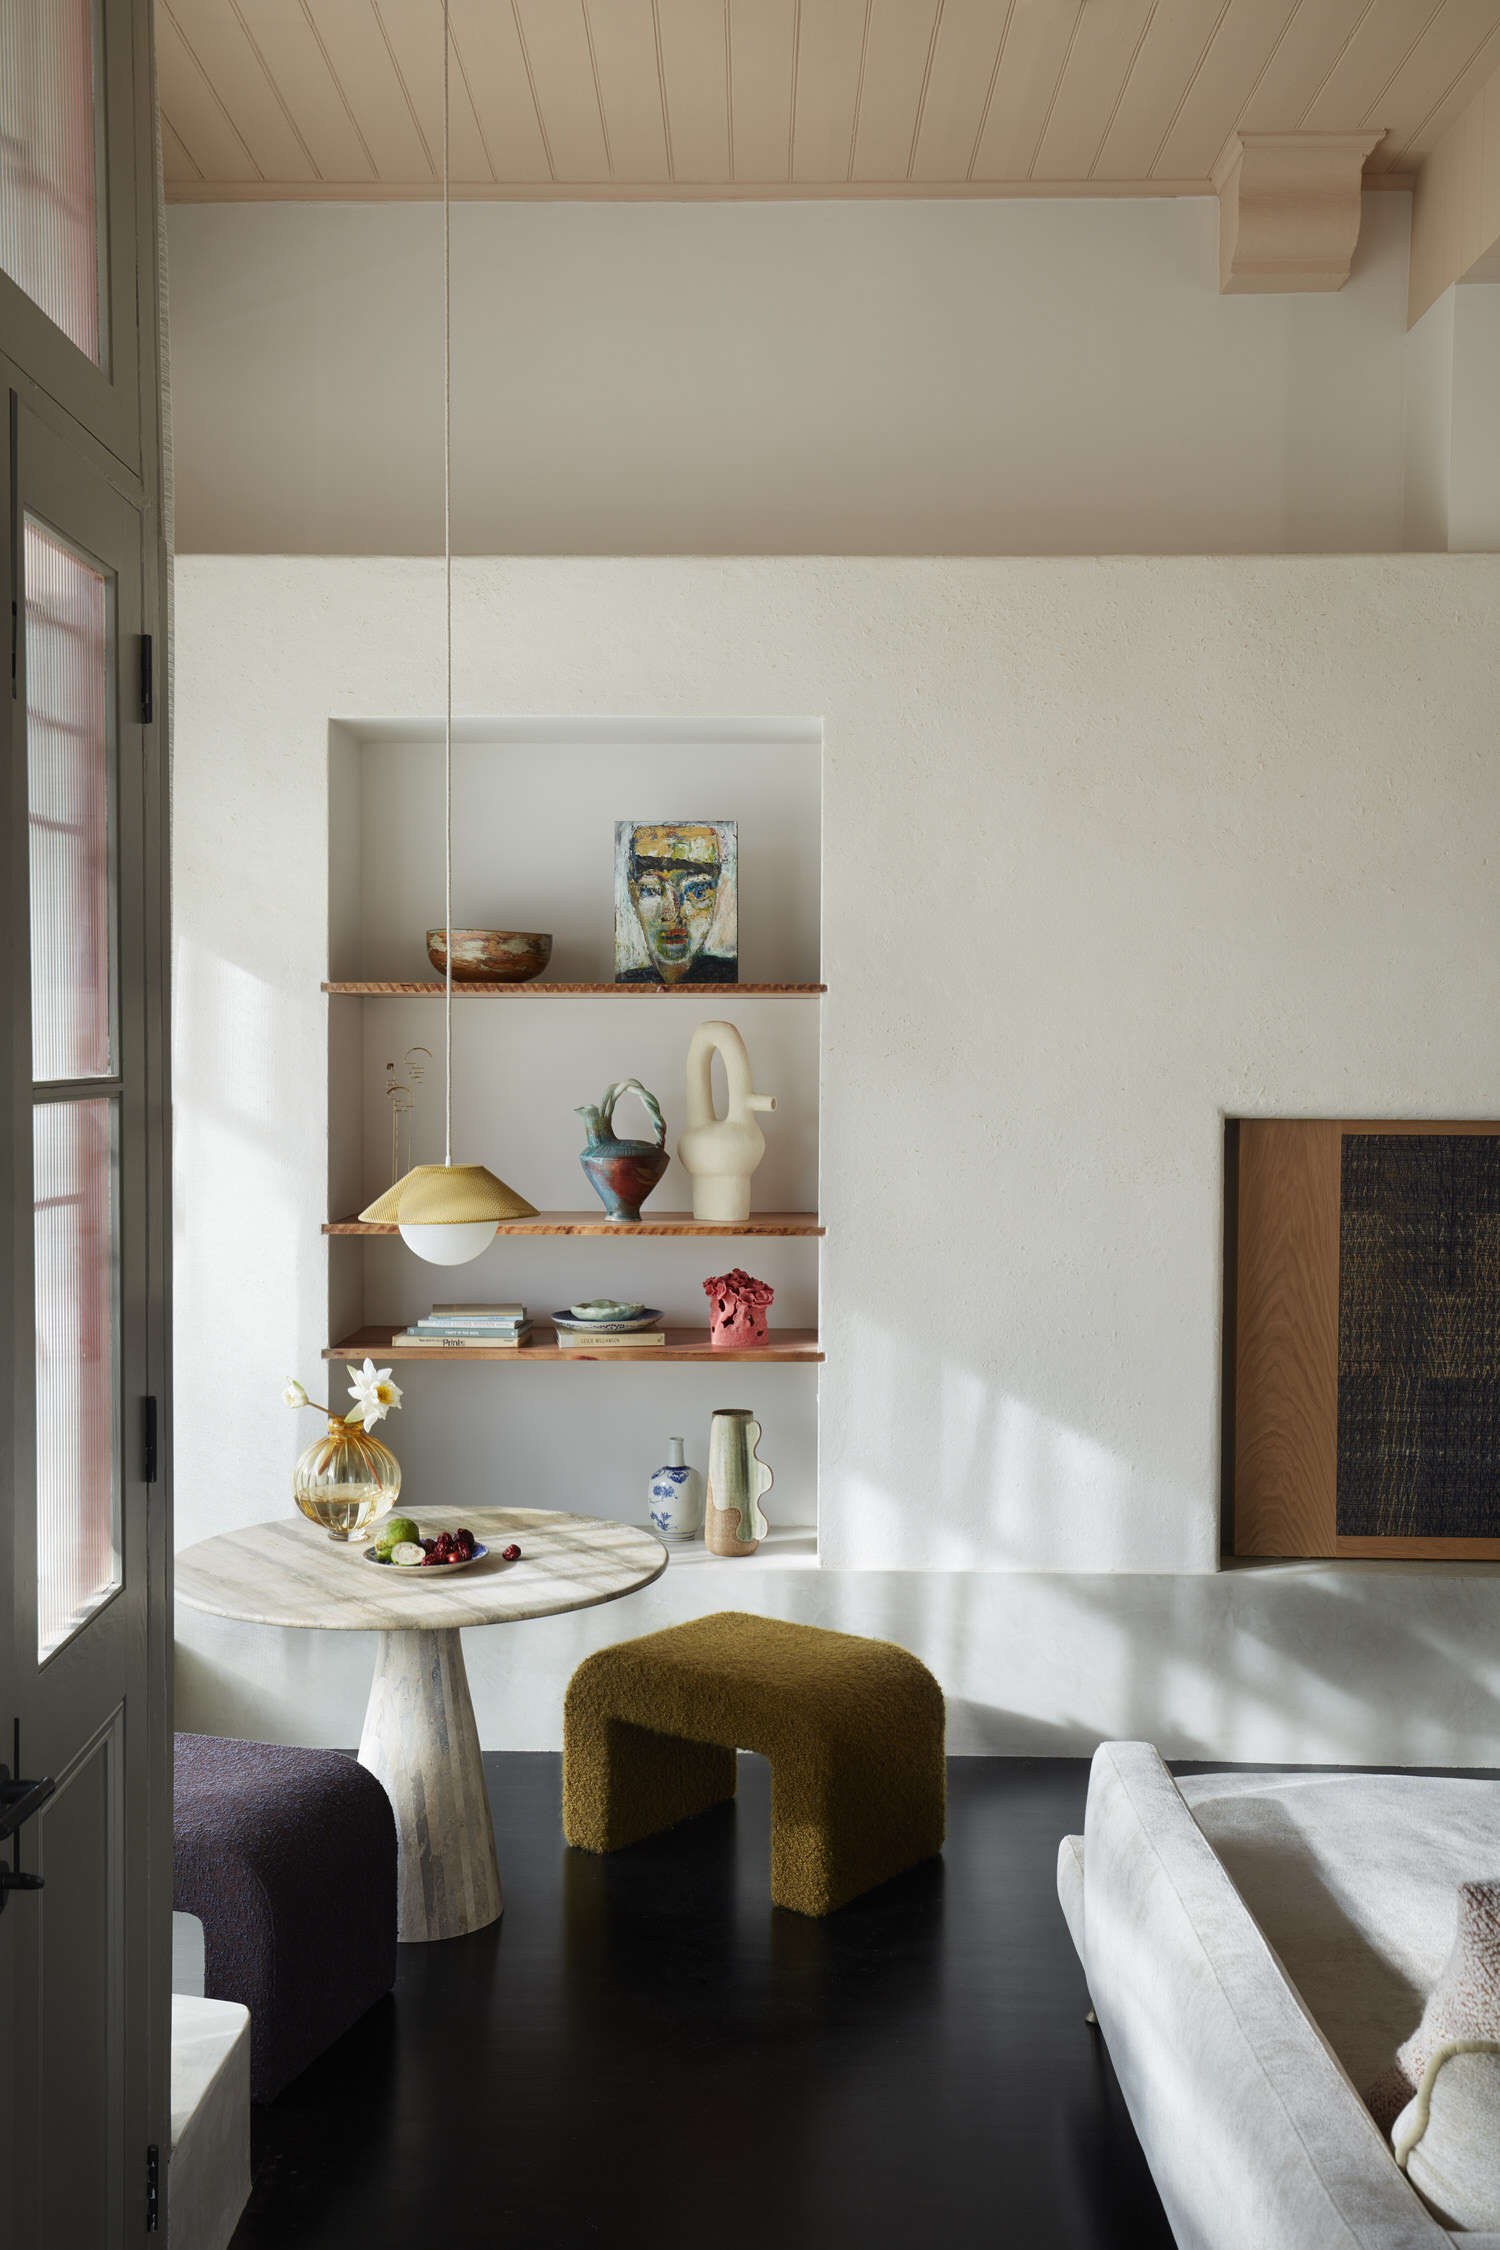 Ysg Studio Soft Serve 75 Evans St Rozelle Sydney Property Photo Prue Ruscoe Yellowtrace 33